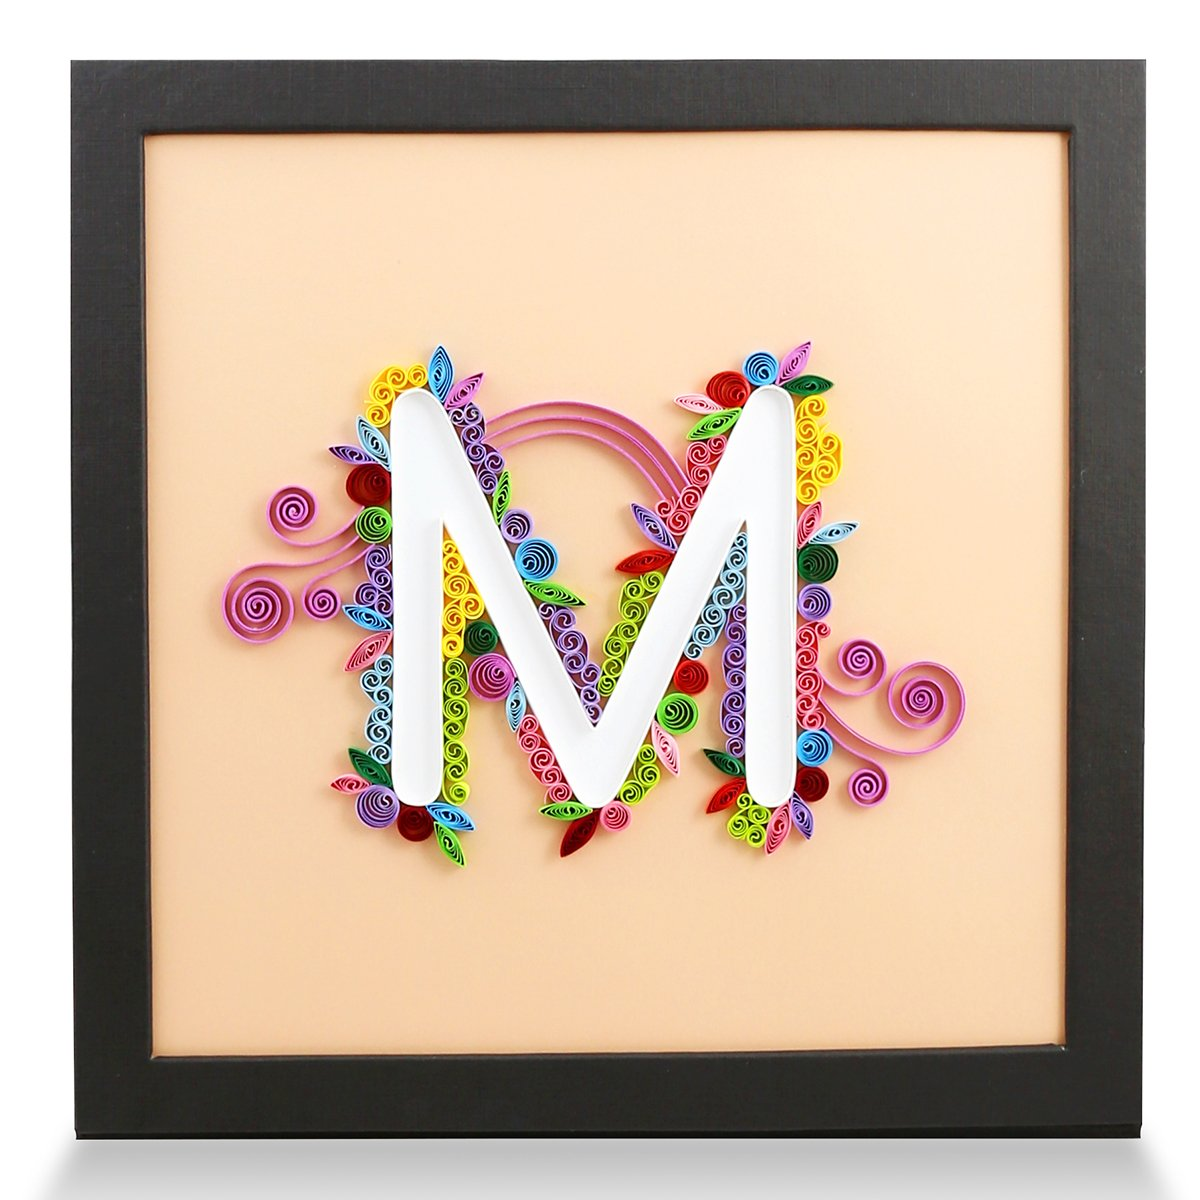 Amazon.com: PaperTalk LETTER M 100% Handmade Paper-Quilling Artwork ...